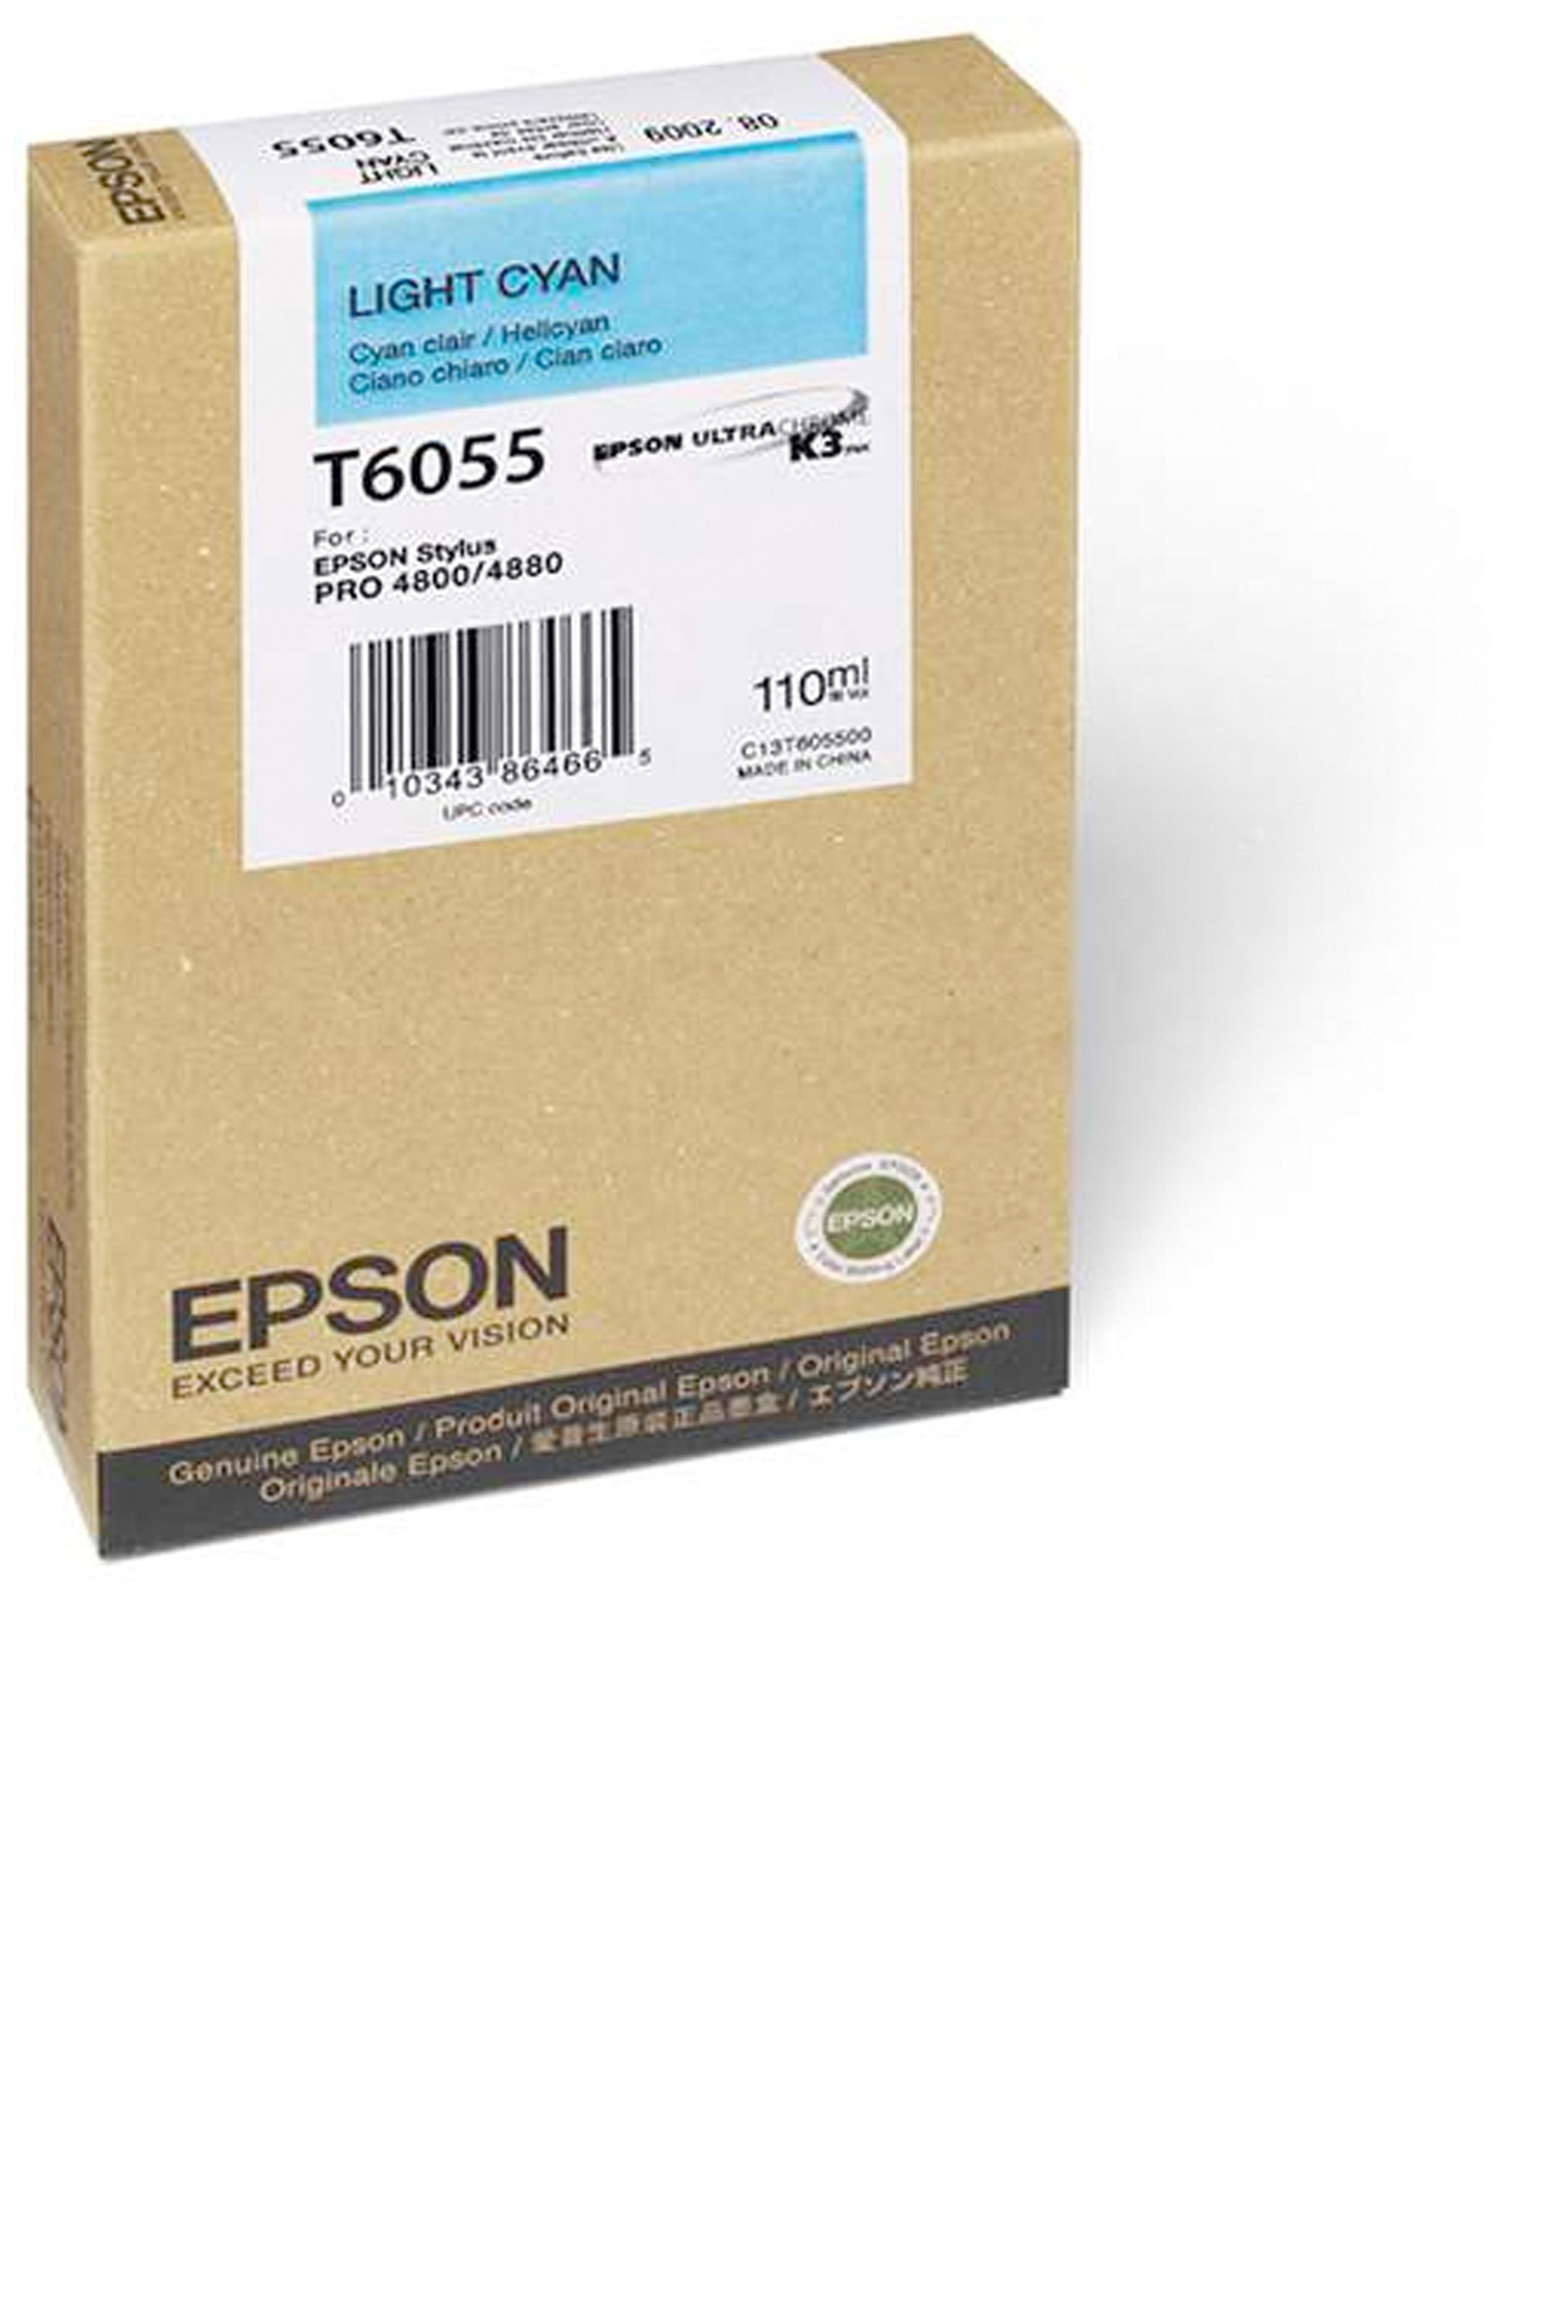 Epson EPSON SD LT CYAN INK (110 ML) (T605500)